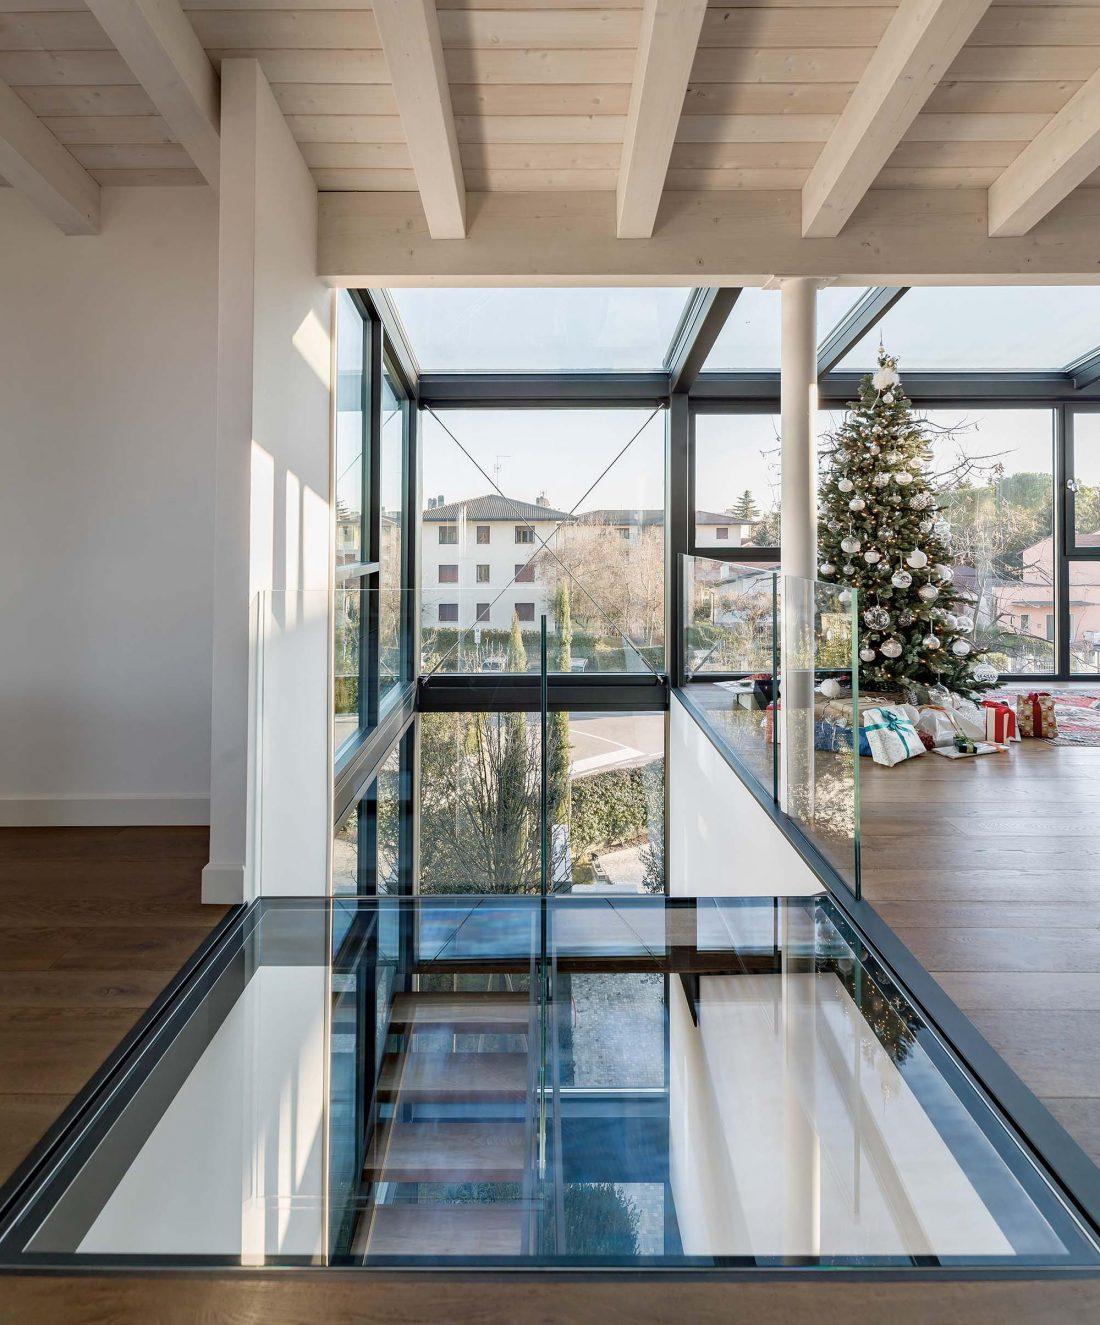 Дом в Порденоне, Италия, от студии Caprioglio Associati Architects 32